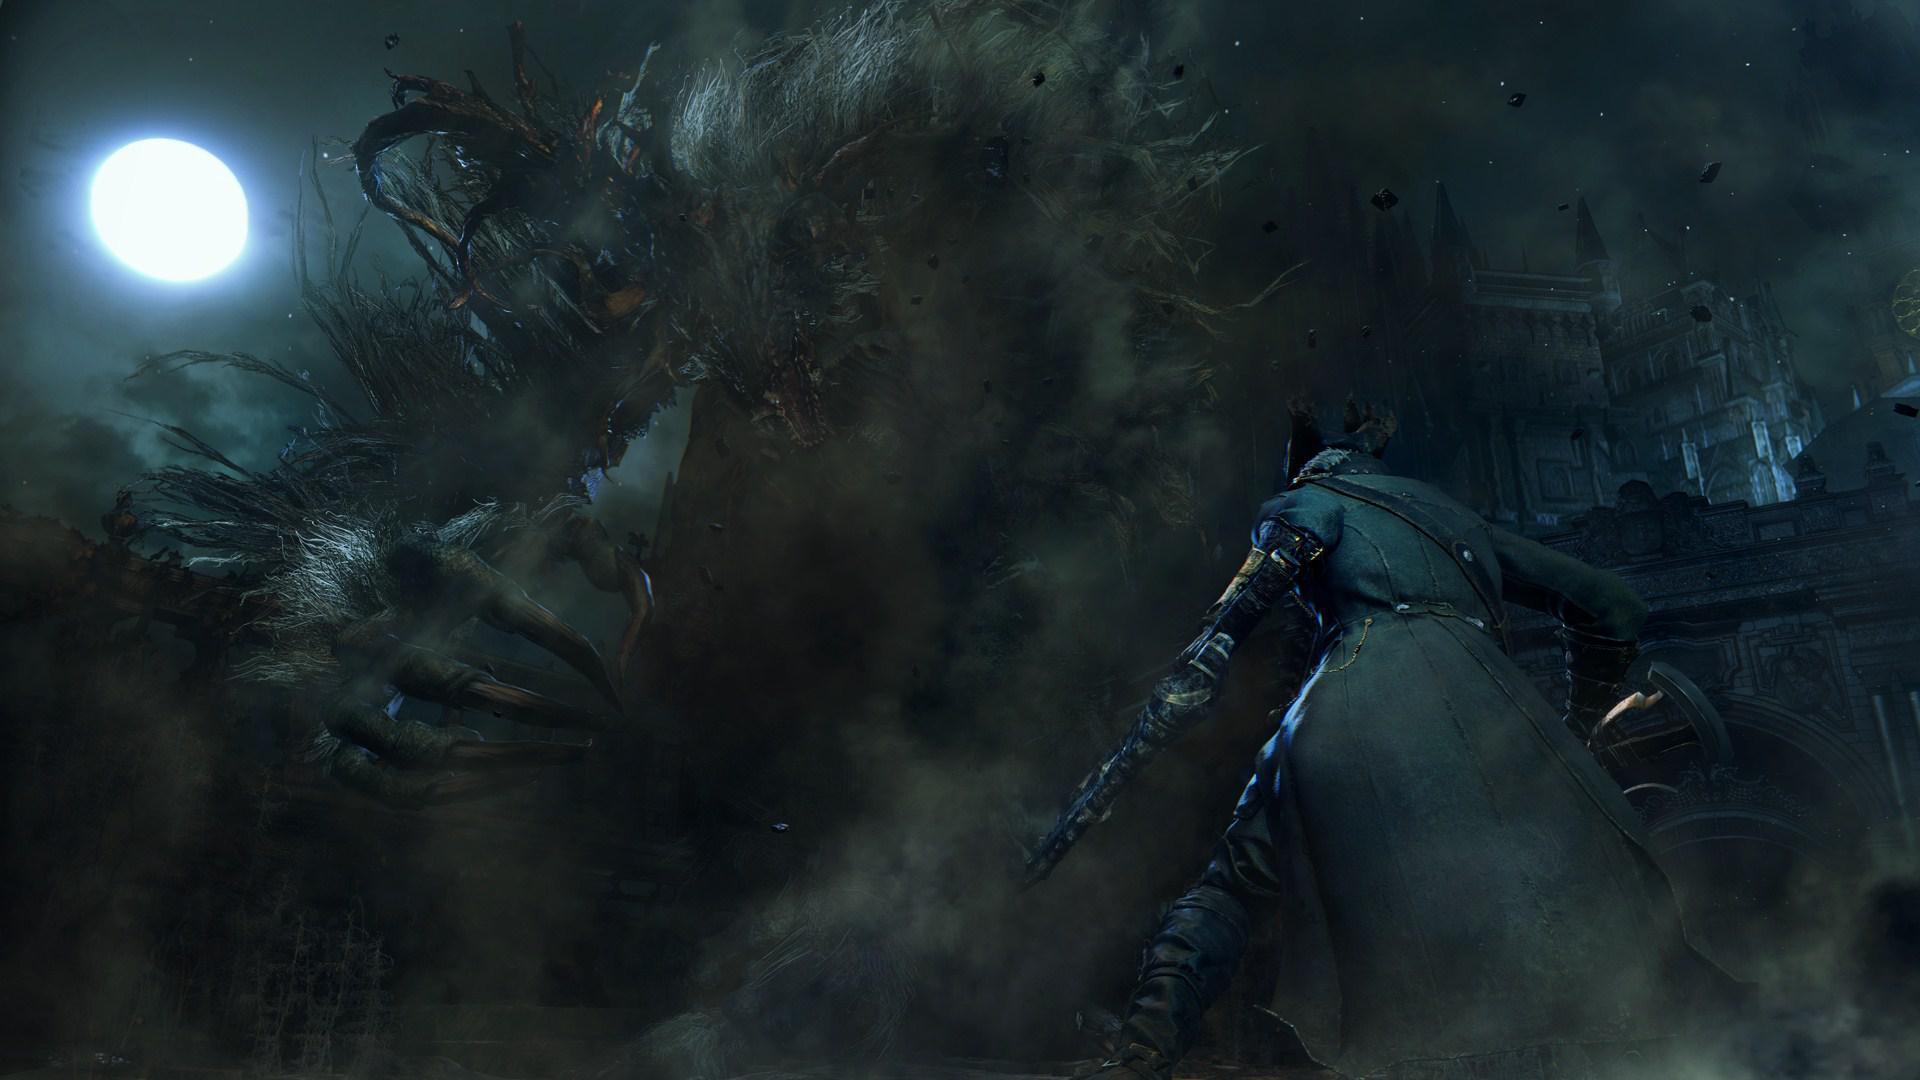 HD Bloodborne PS4 Game Wallpaper Download Free 139968